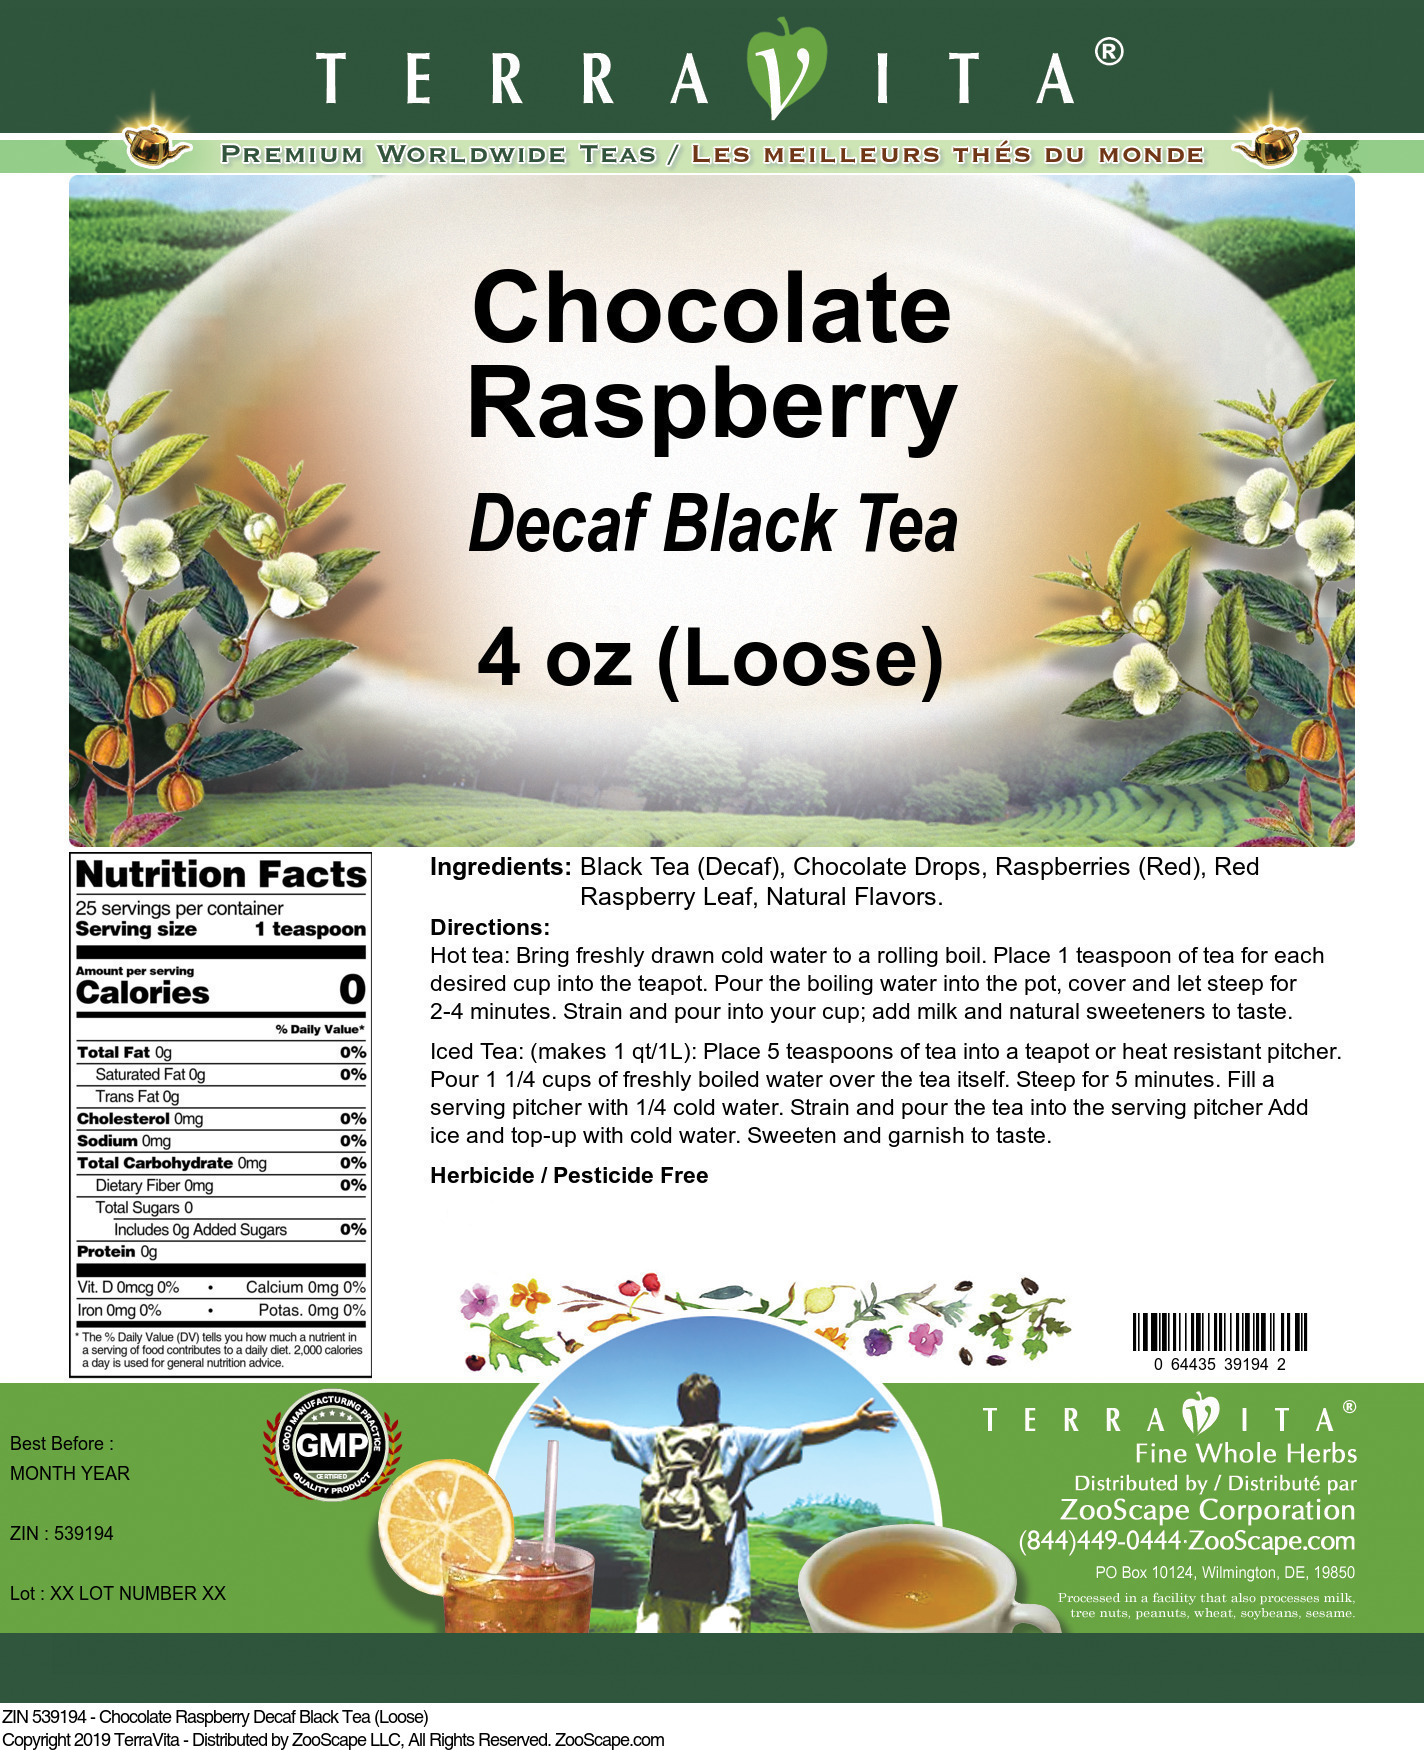 Chocolate Raspberry Decaf Black Tea